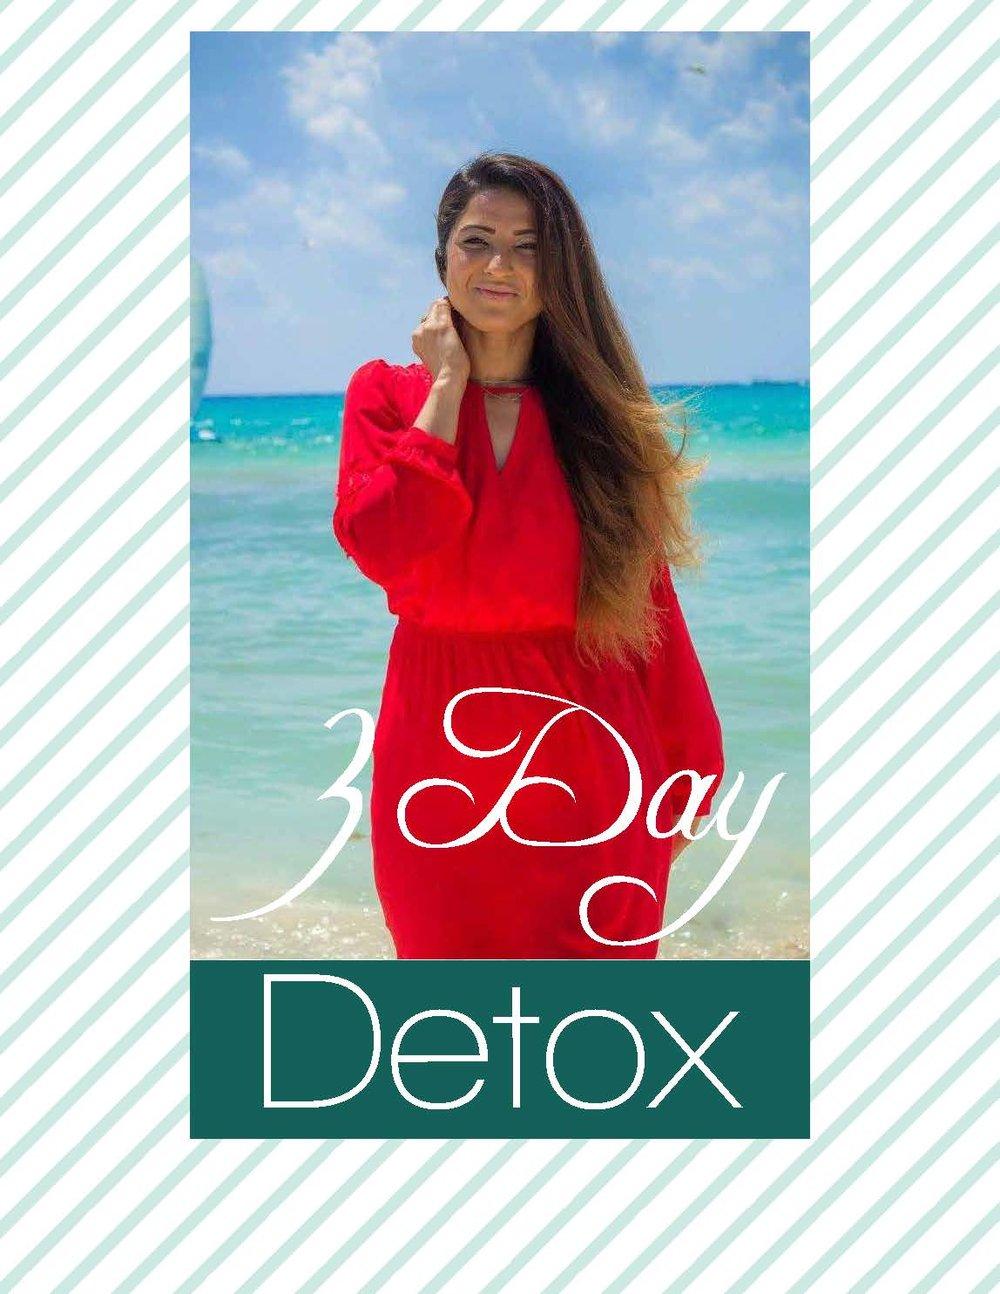 Farrah Opt In Detox Plan January 2019 Update 1.jpg